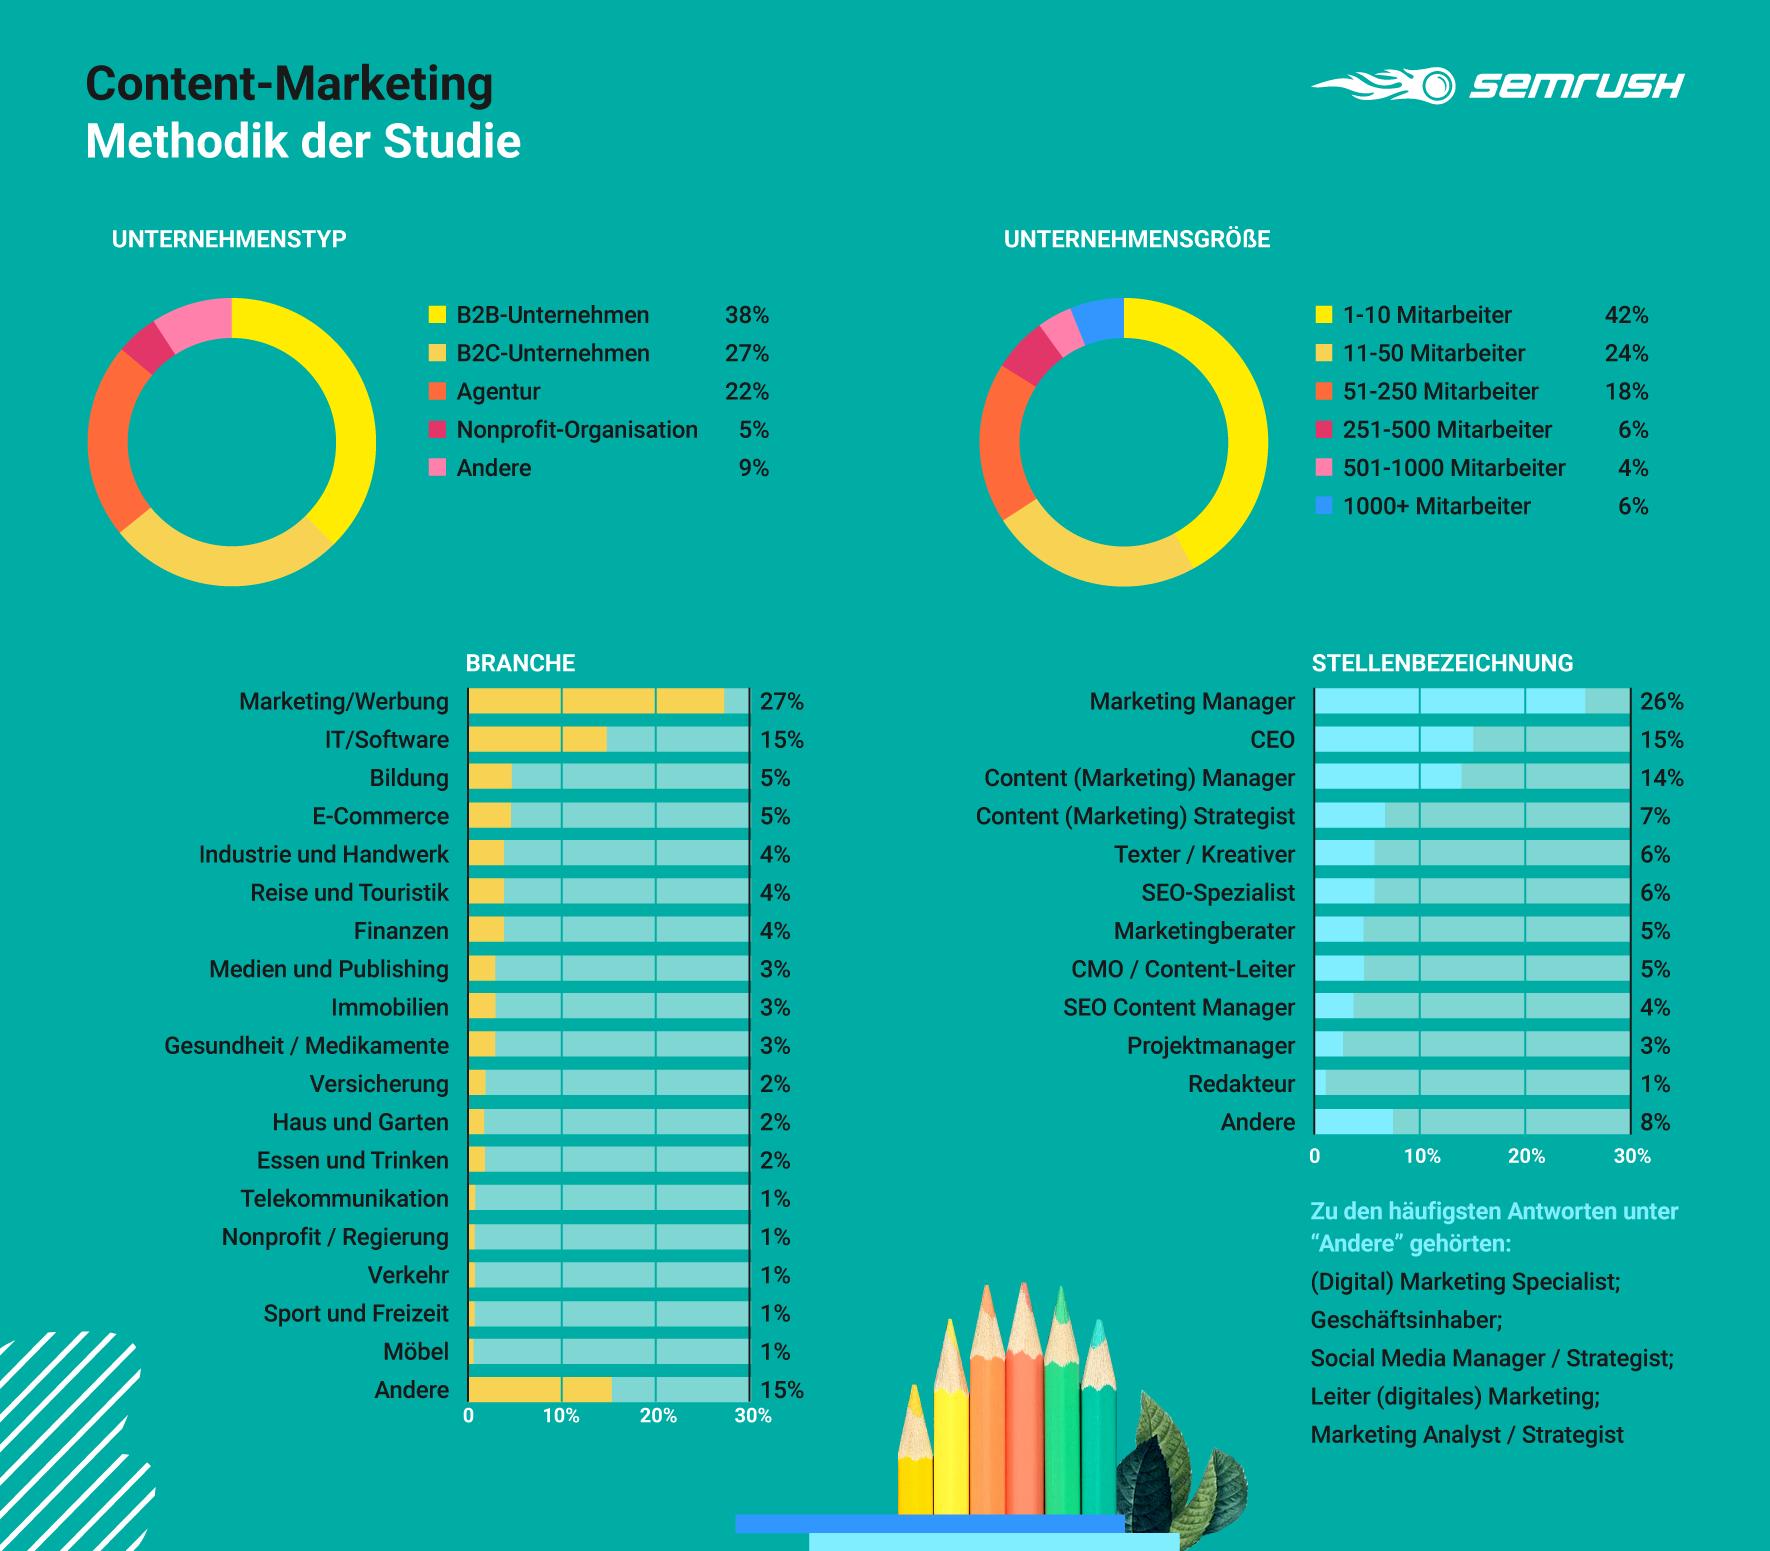 Content-Marketing: Methodik der Studie